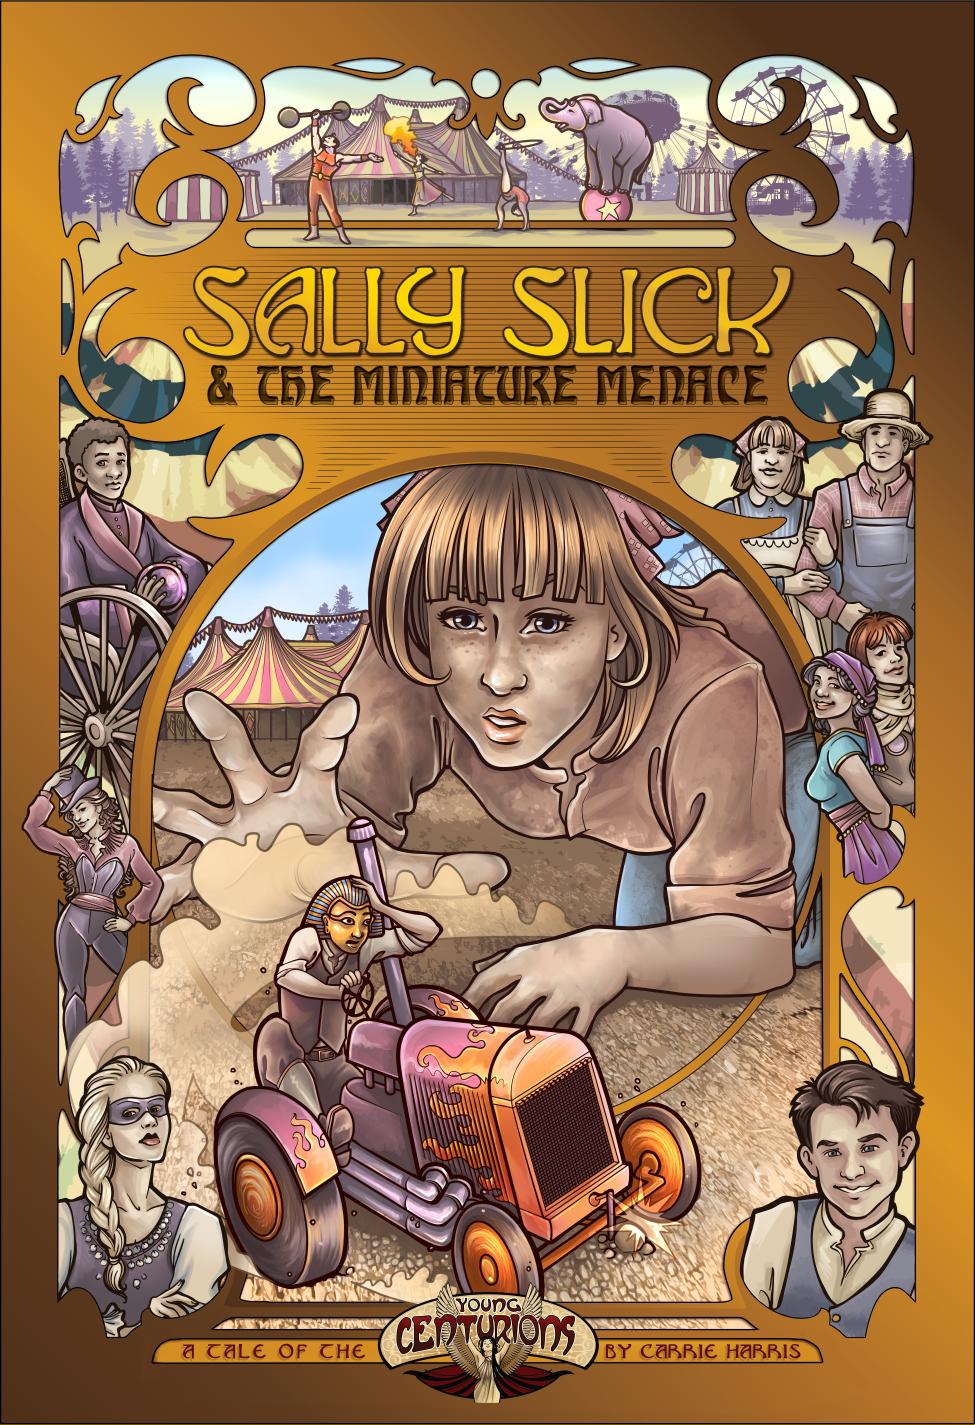 Capa de Resenha - Sally Slick and the Miniature Menace